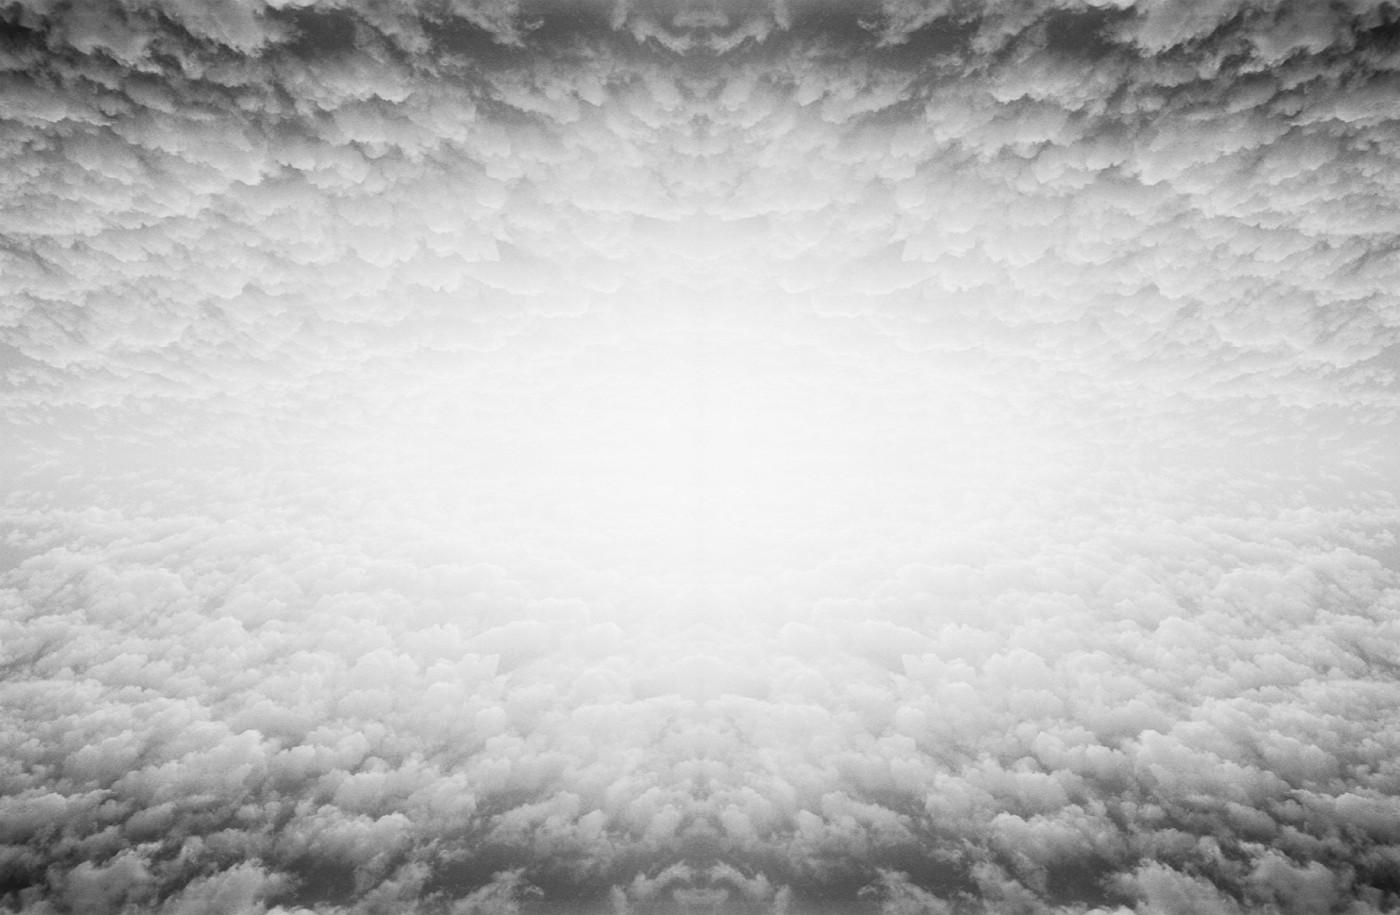 "Aaron Friend Lettner, </span><span><em>Clouds</em>, </span><span>p.42-43, 2017. Book, 8 x 10.5""."